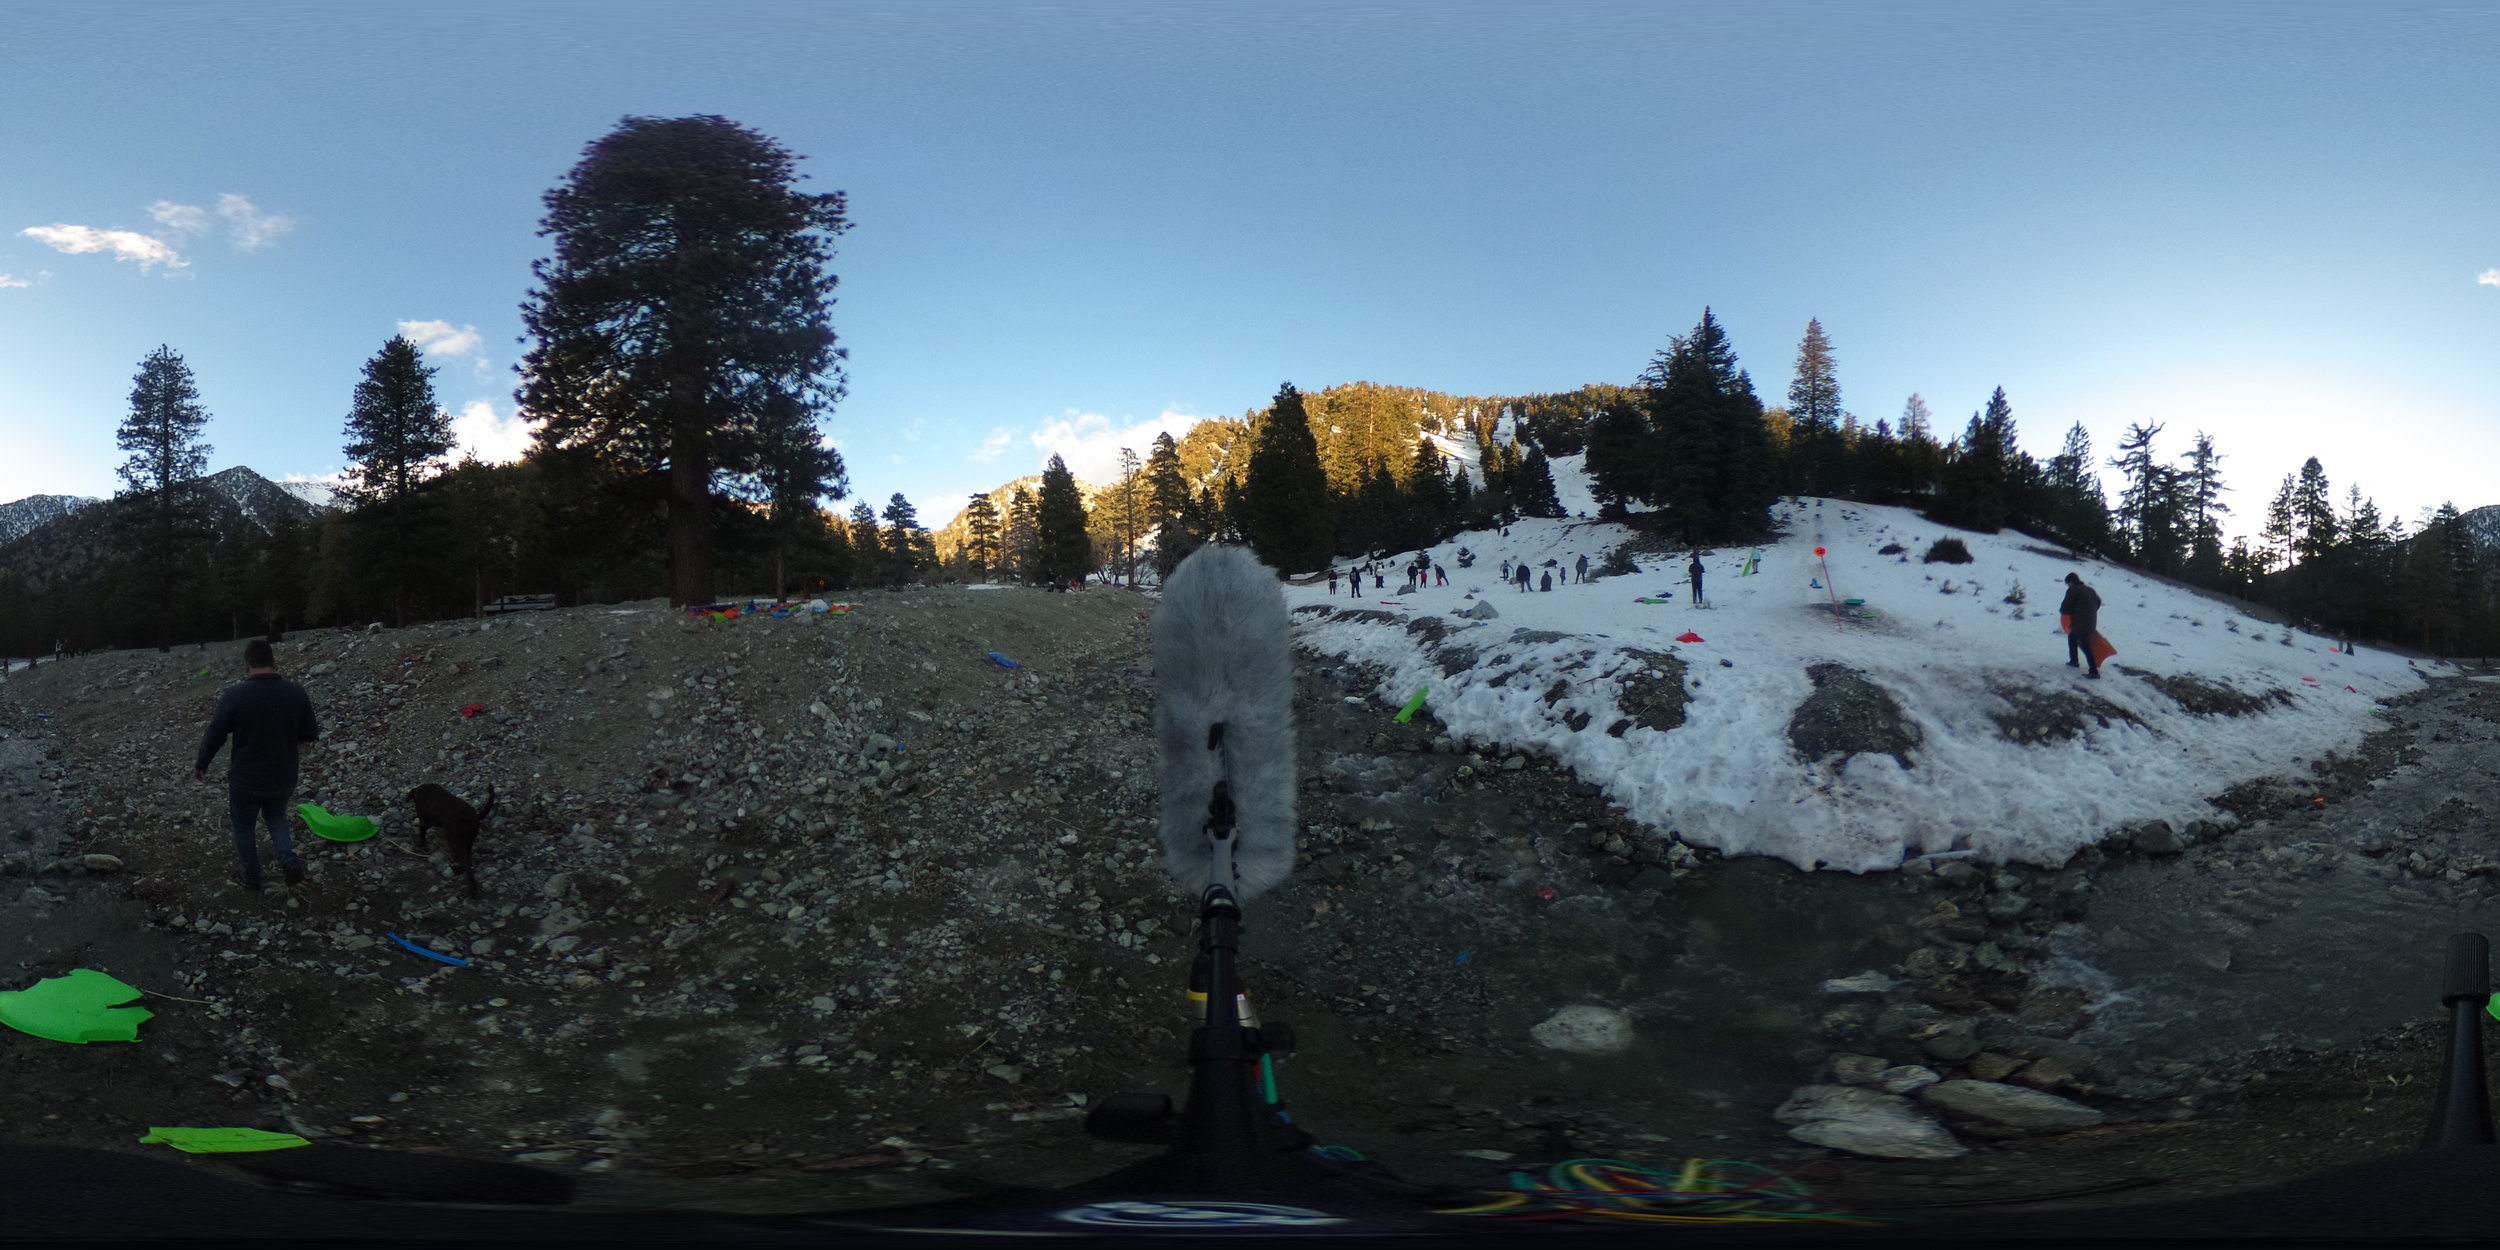 EXT_Day_Snow_Park_Stream_DistantPlaying_JPEG.JPG